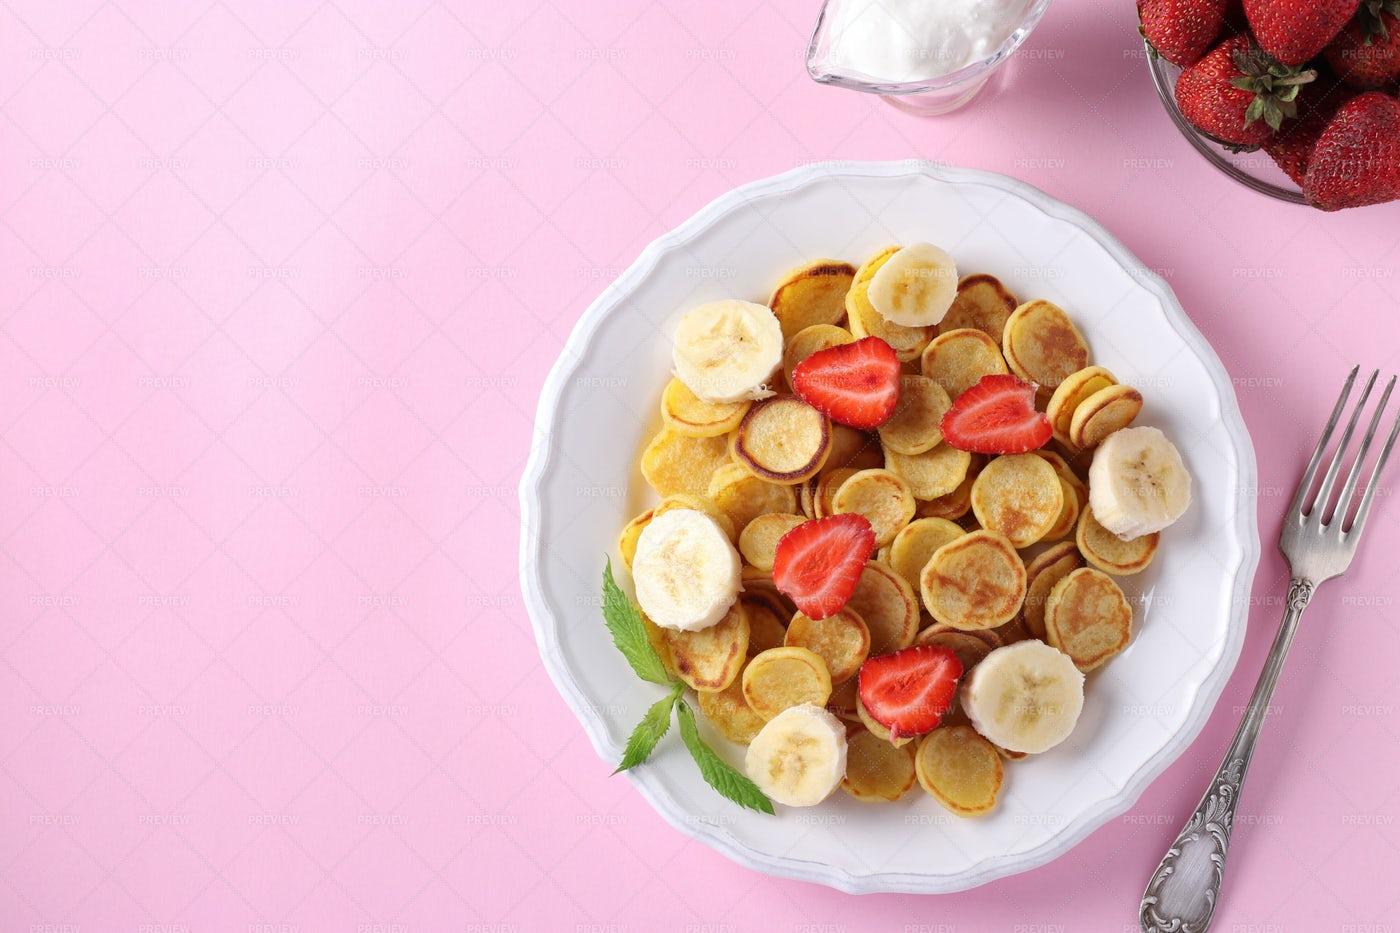 Trendy Tiny Pancakes: Stock Photos